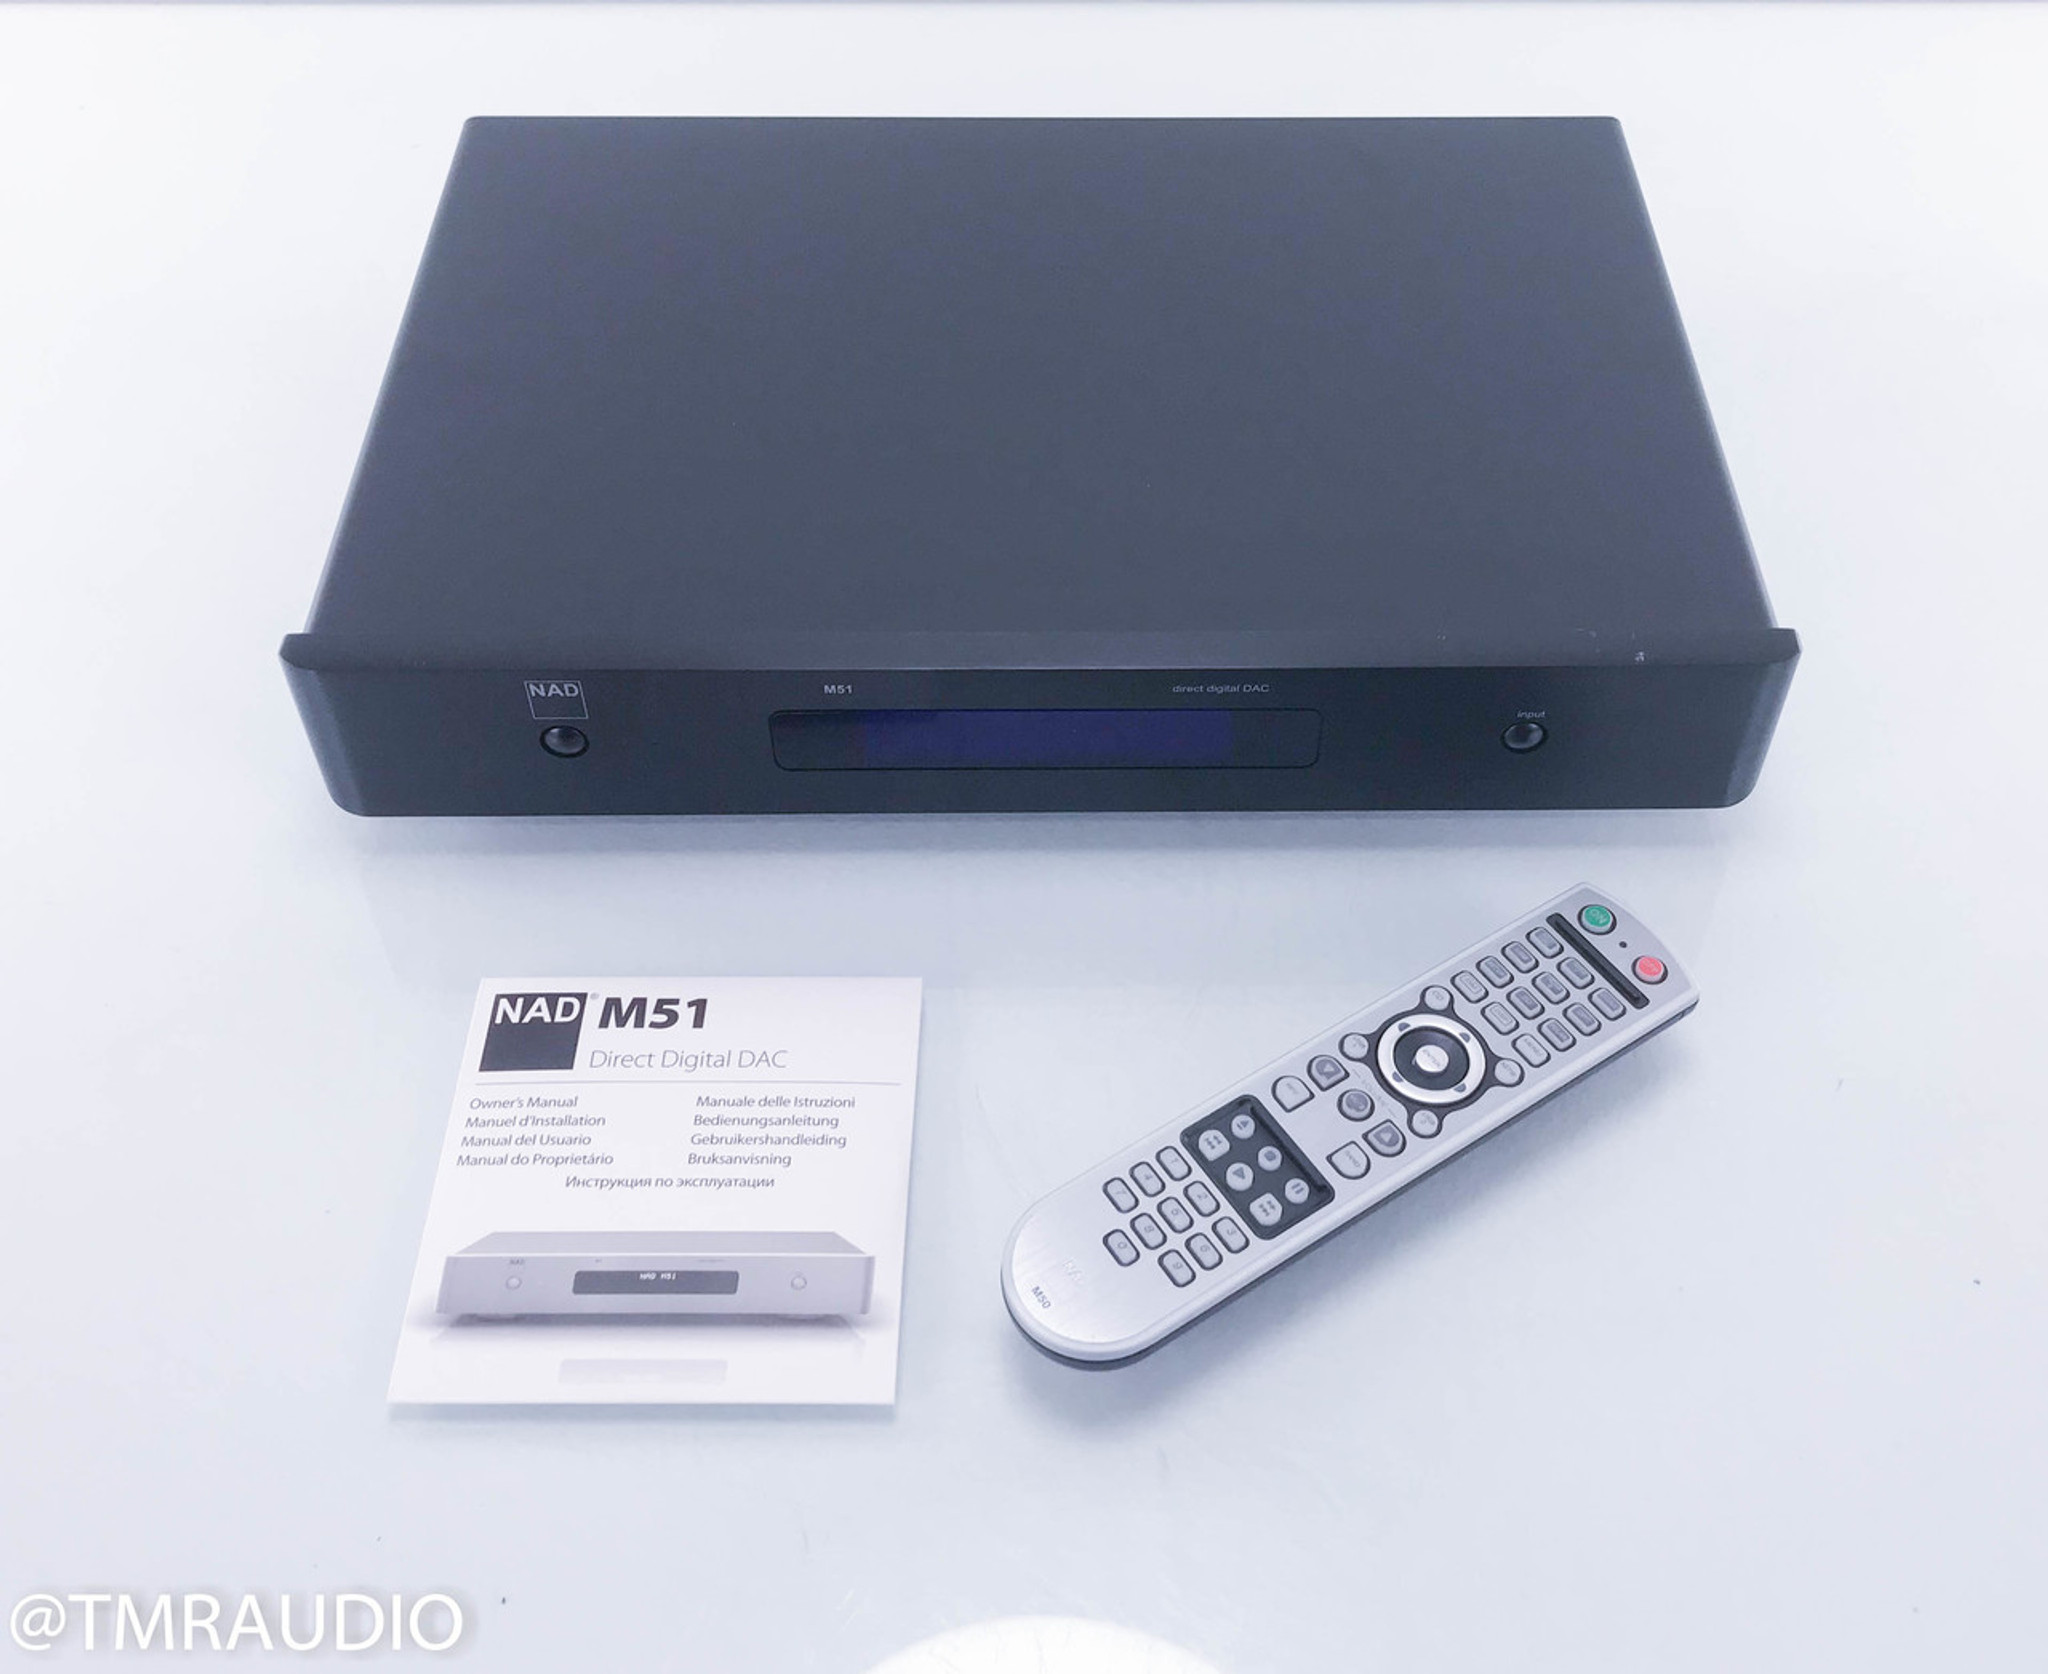 nad m51 direct digital dac d a converter the music room rh tmraudio com nad m51 manual pdf NAD M51 Firmware